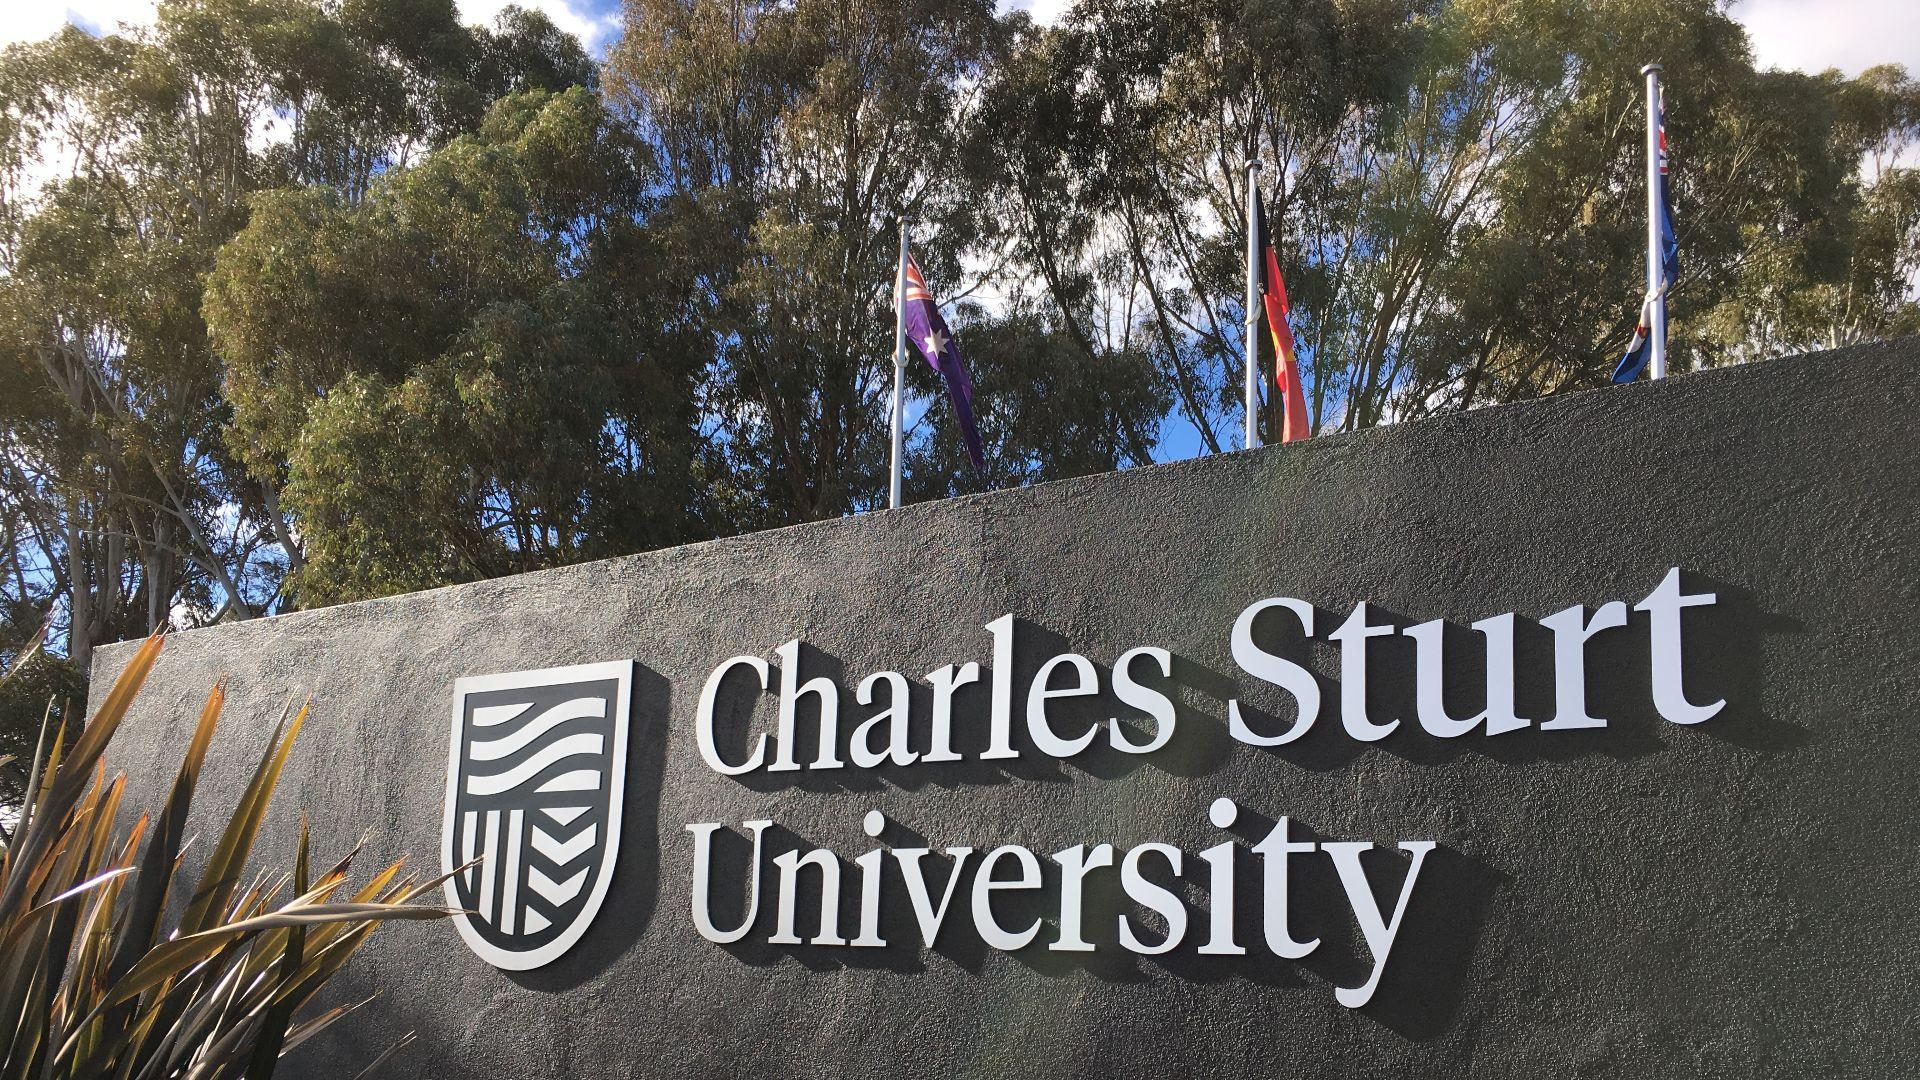 Charles Sturt's international education focus shifts, partnership concludes